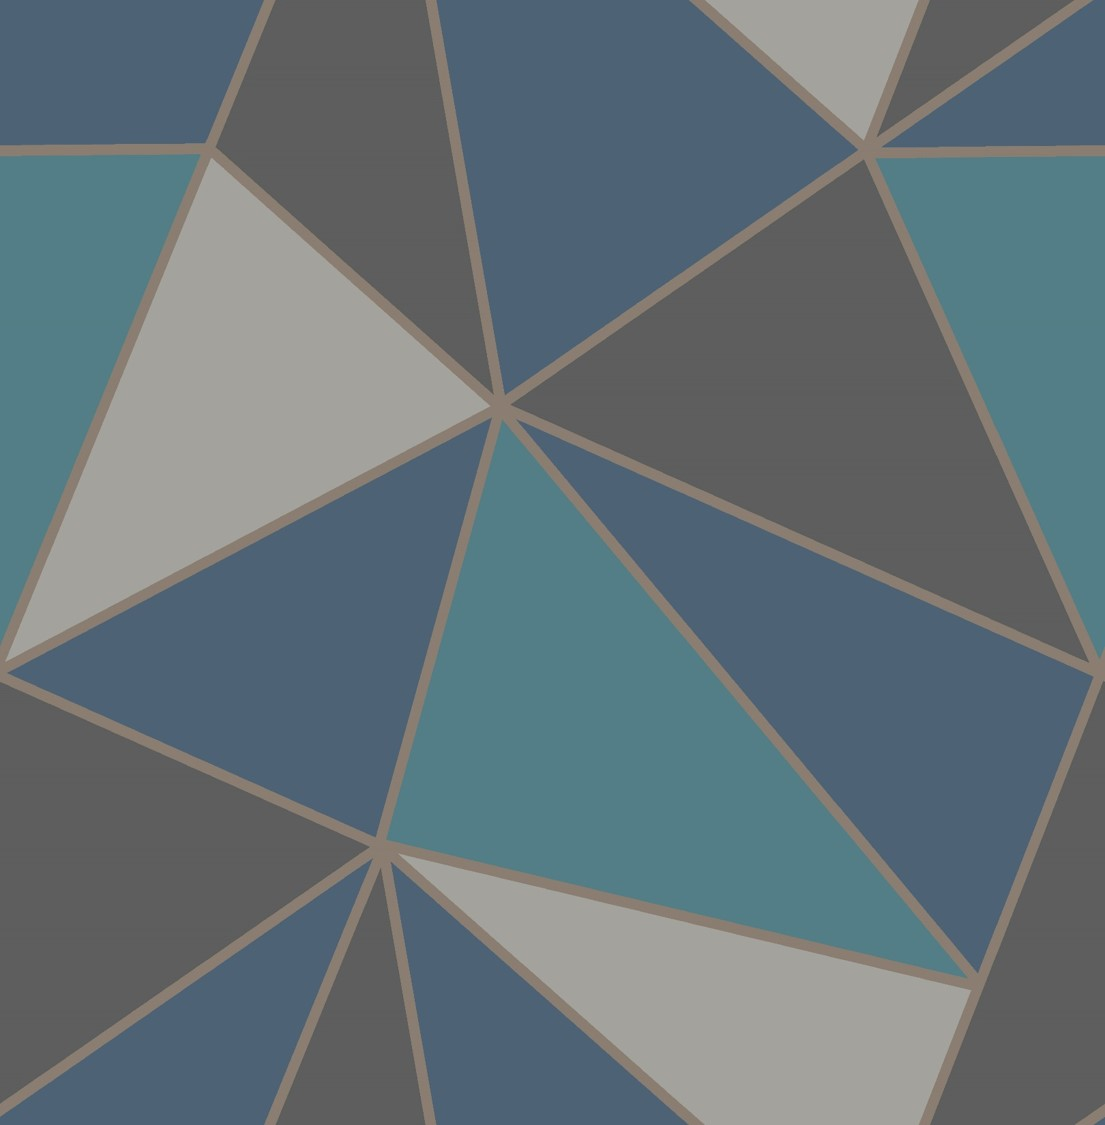 Fine Decor Apex Geometric Wallpaper-FD42001-Navy/Grey